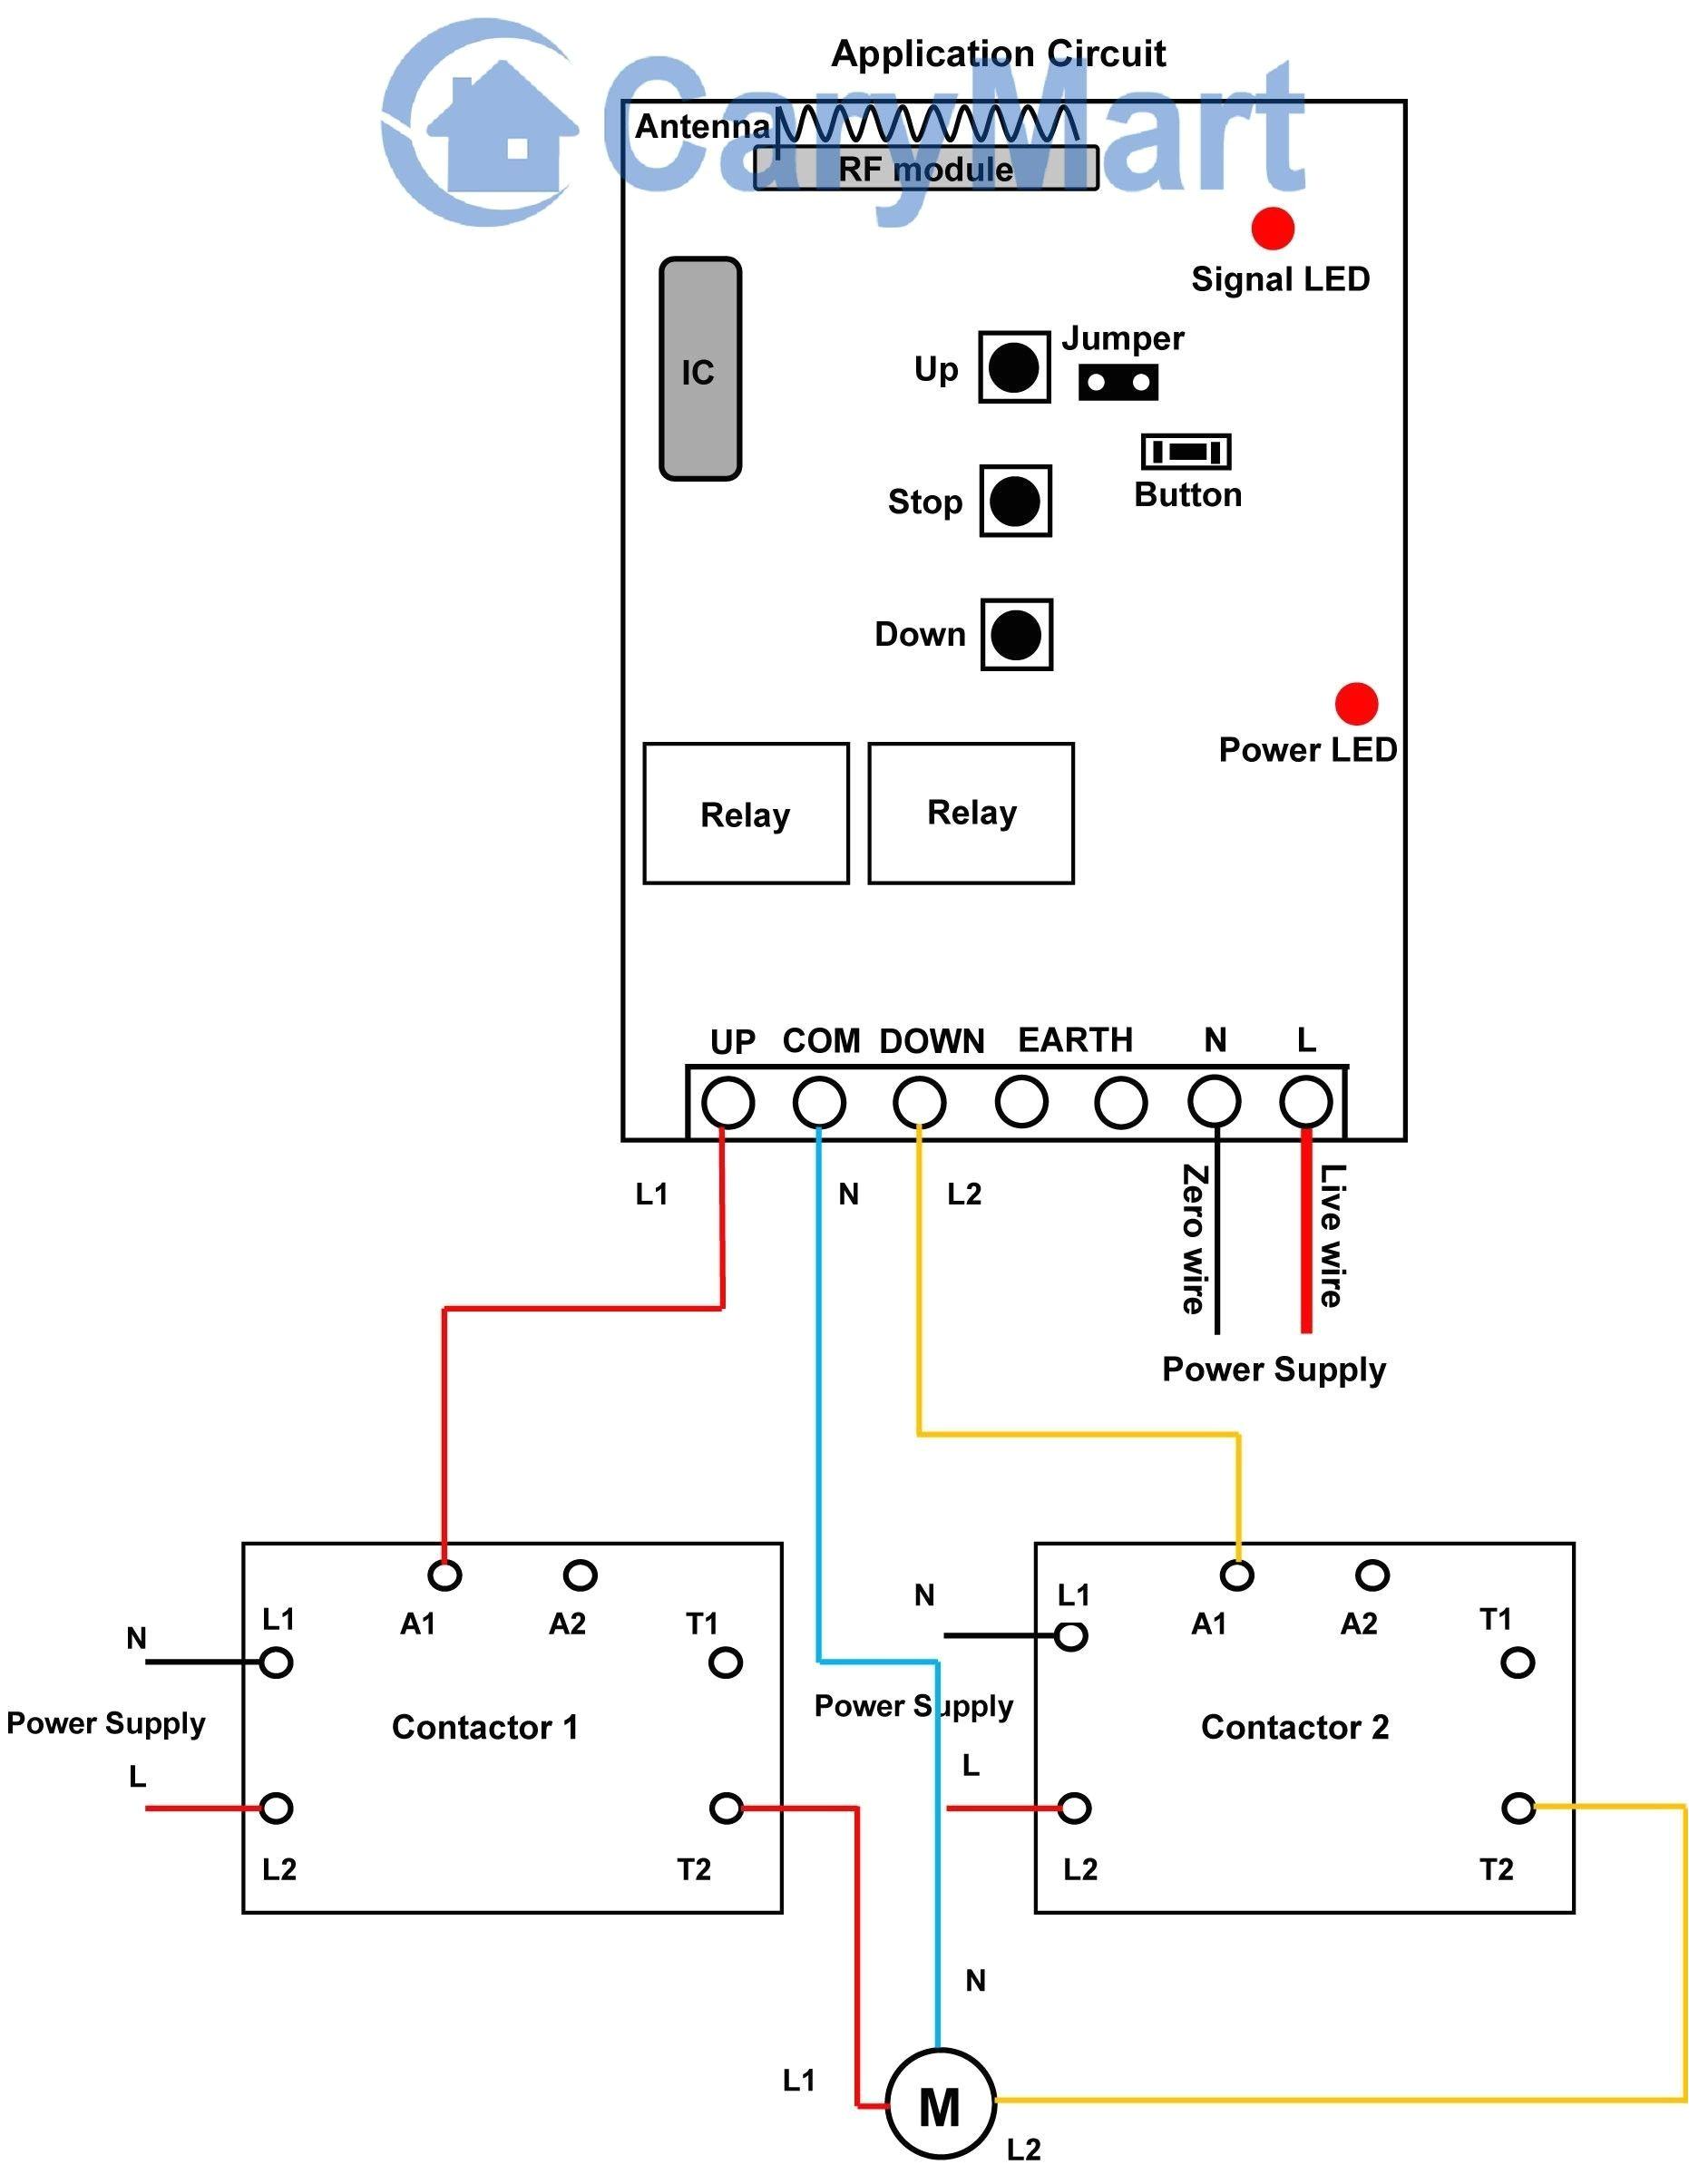 4 Pole Lighting Contactor Wiring Diagram Unique Wiring Diagram for Mechanically Held Lighting